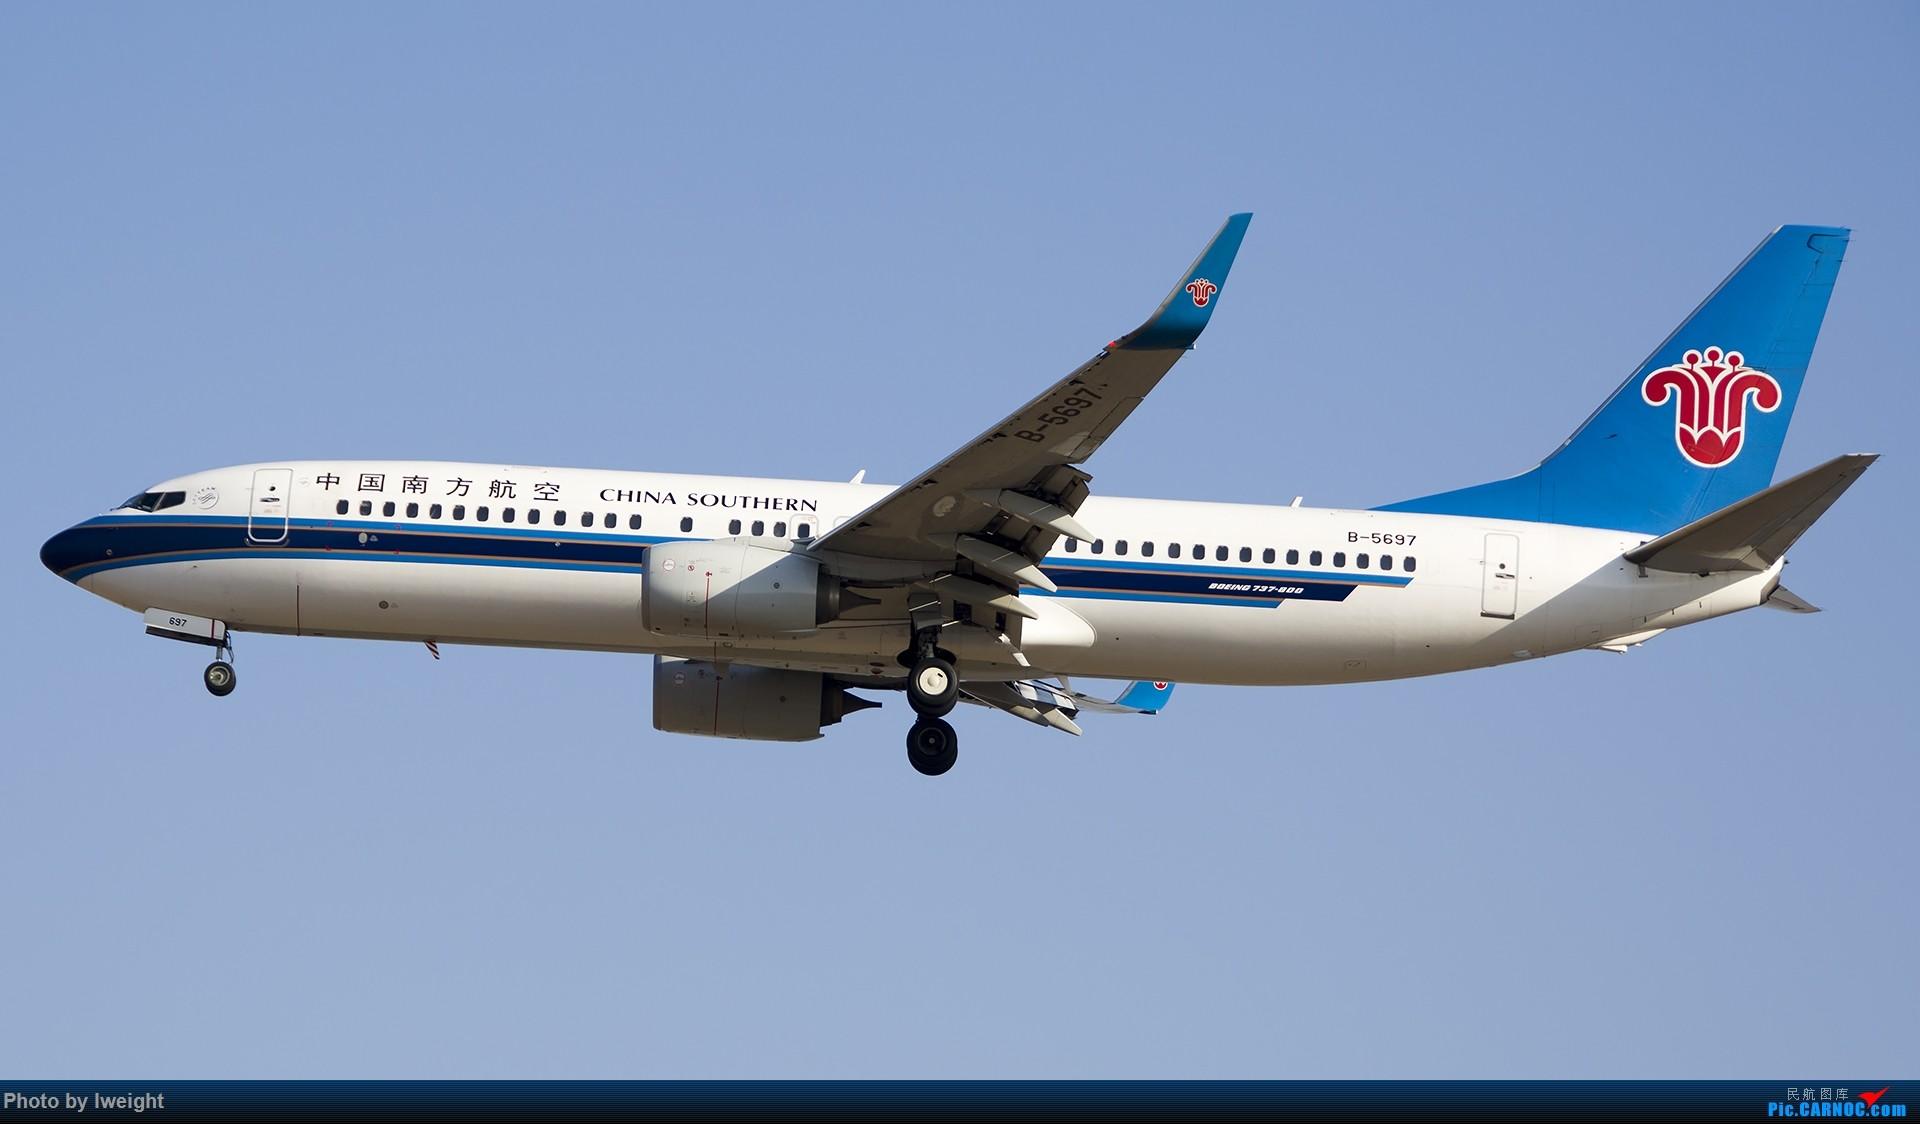 Re:[原创]庆祝升级777,发上今天在首都机场拍的所有飞机【2014-12-14】 BOEING 737-800 B-5697 中国北京首都国际机场